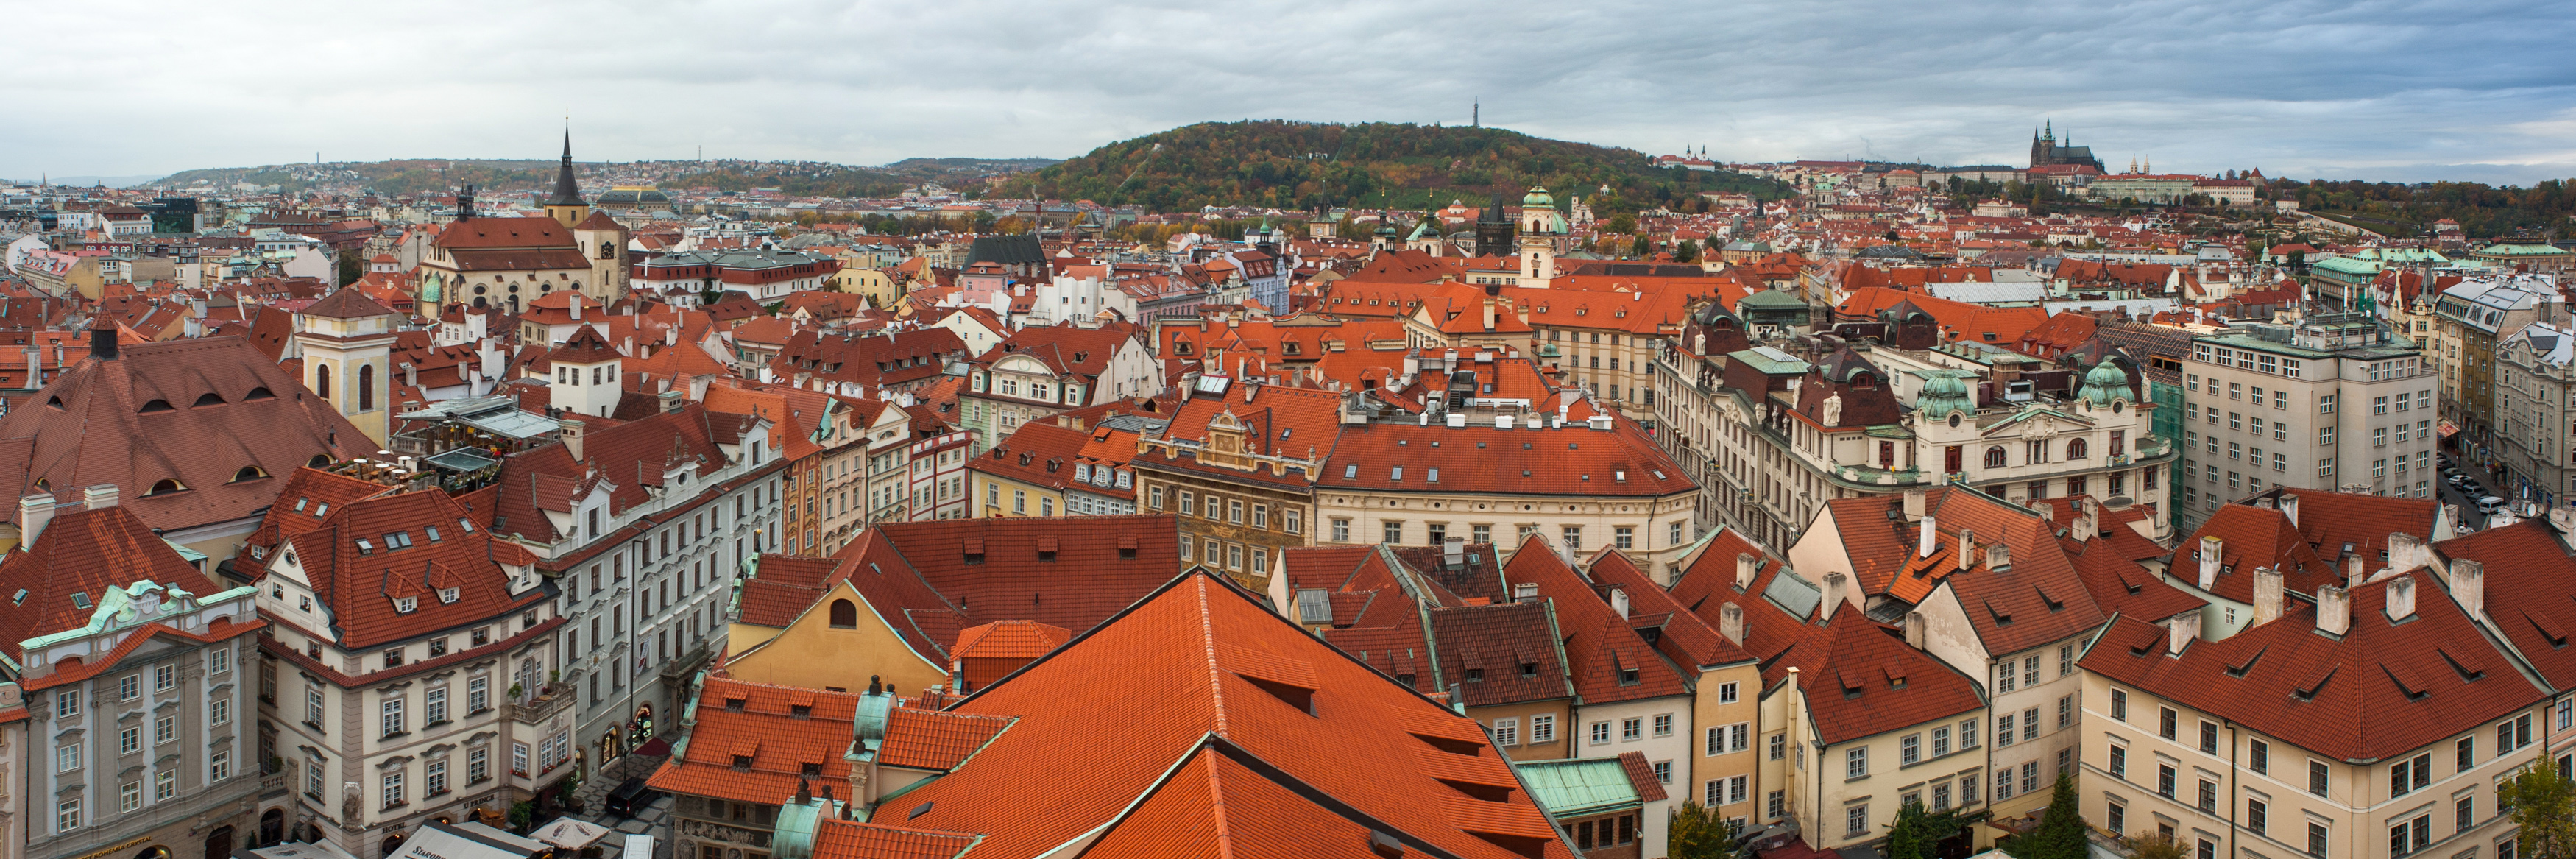 b3f9fd835 File:Panoramic view of Prague. Czech Republic, Western Europe. October 24,  2012.jpg